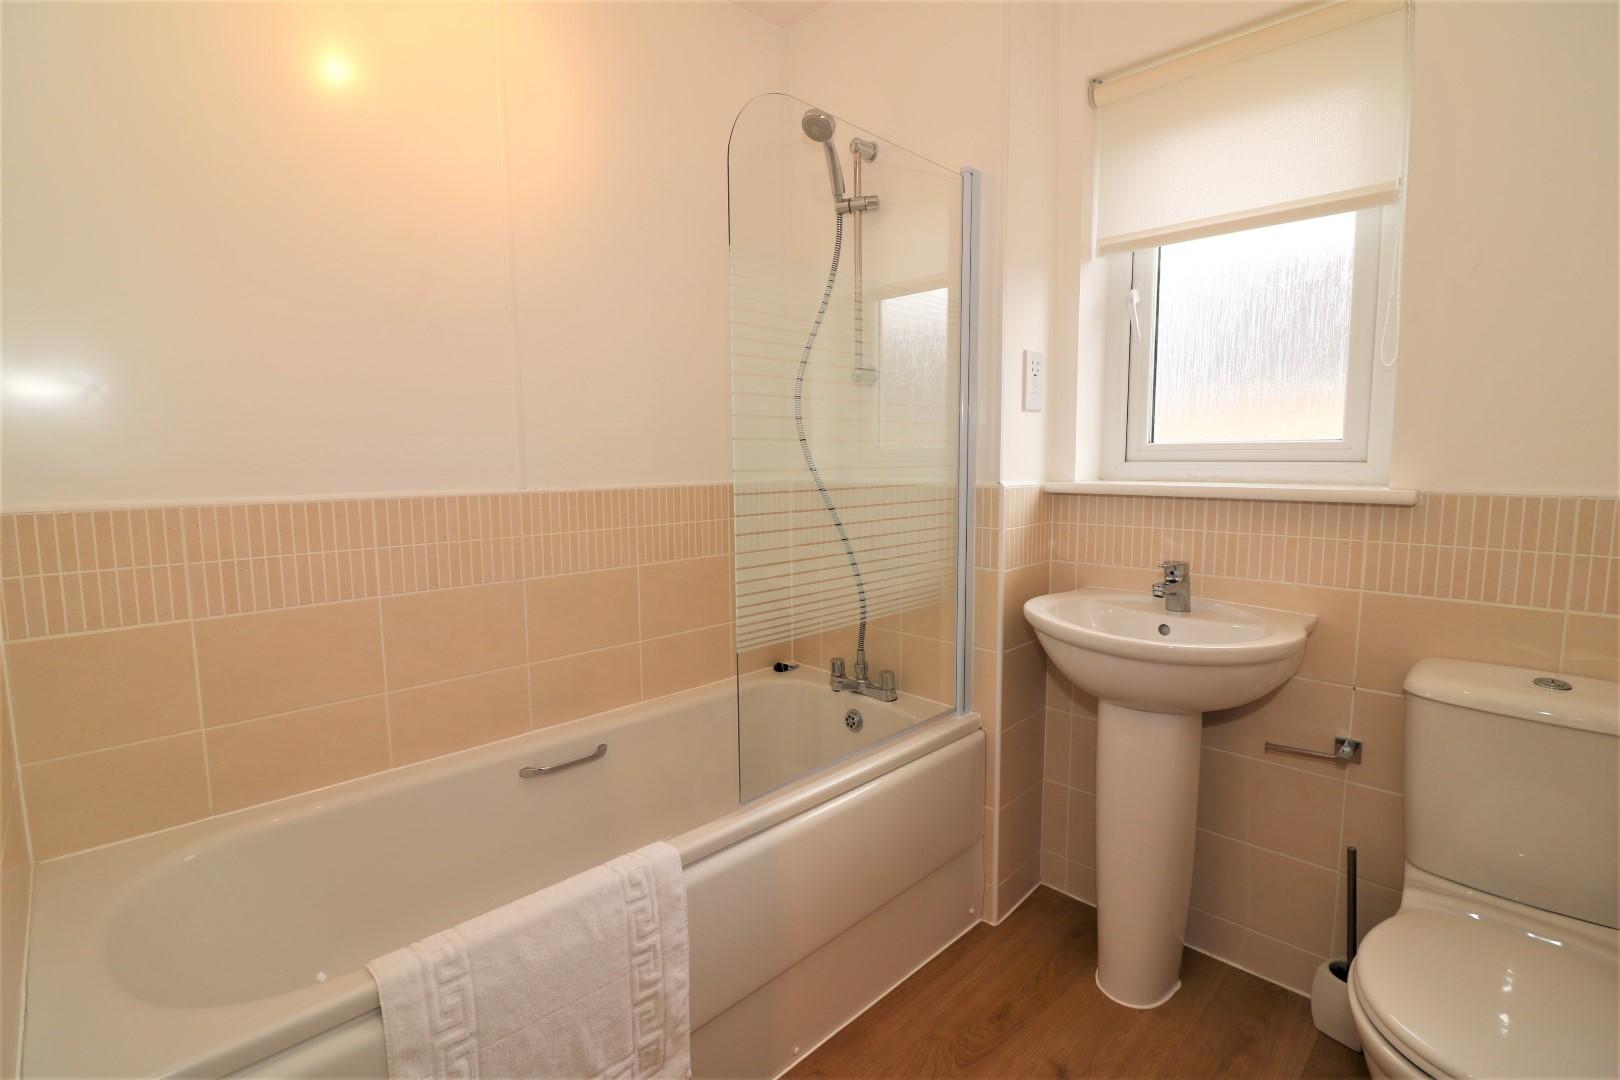 Bathroom at Morrsion Way House